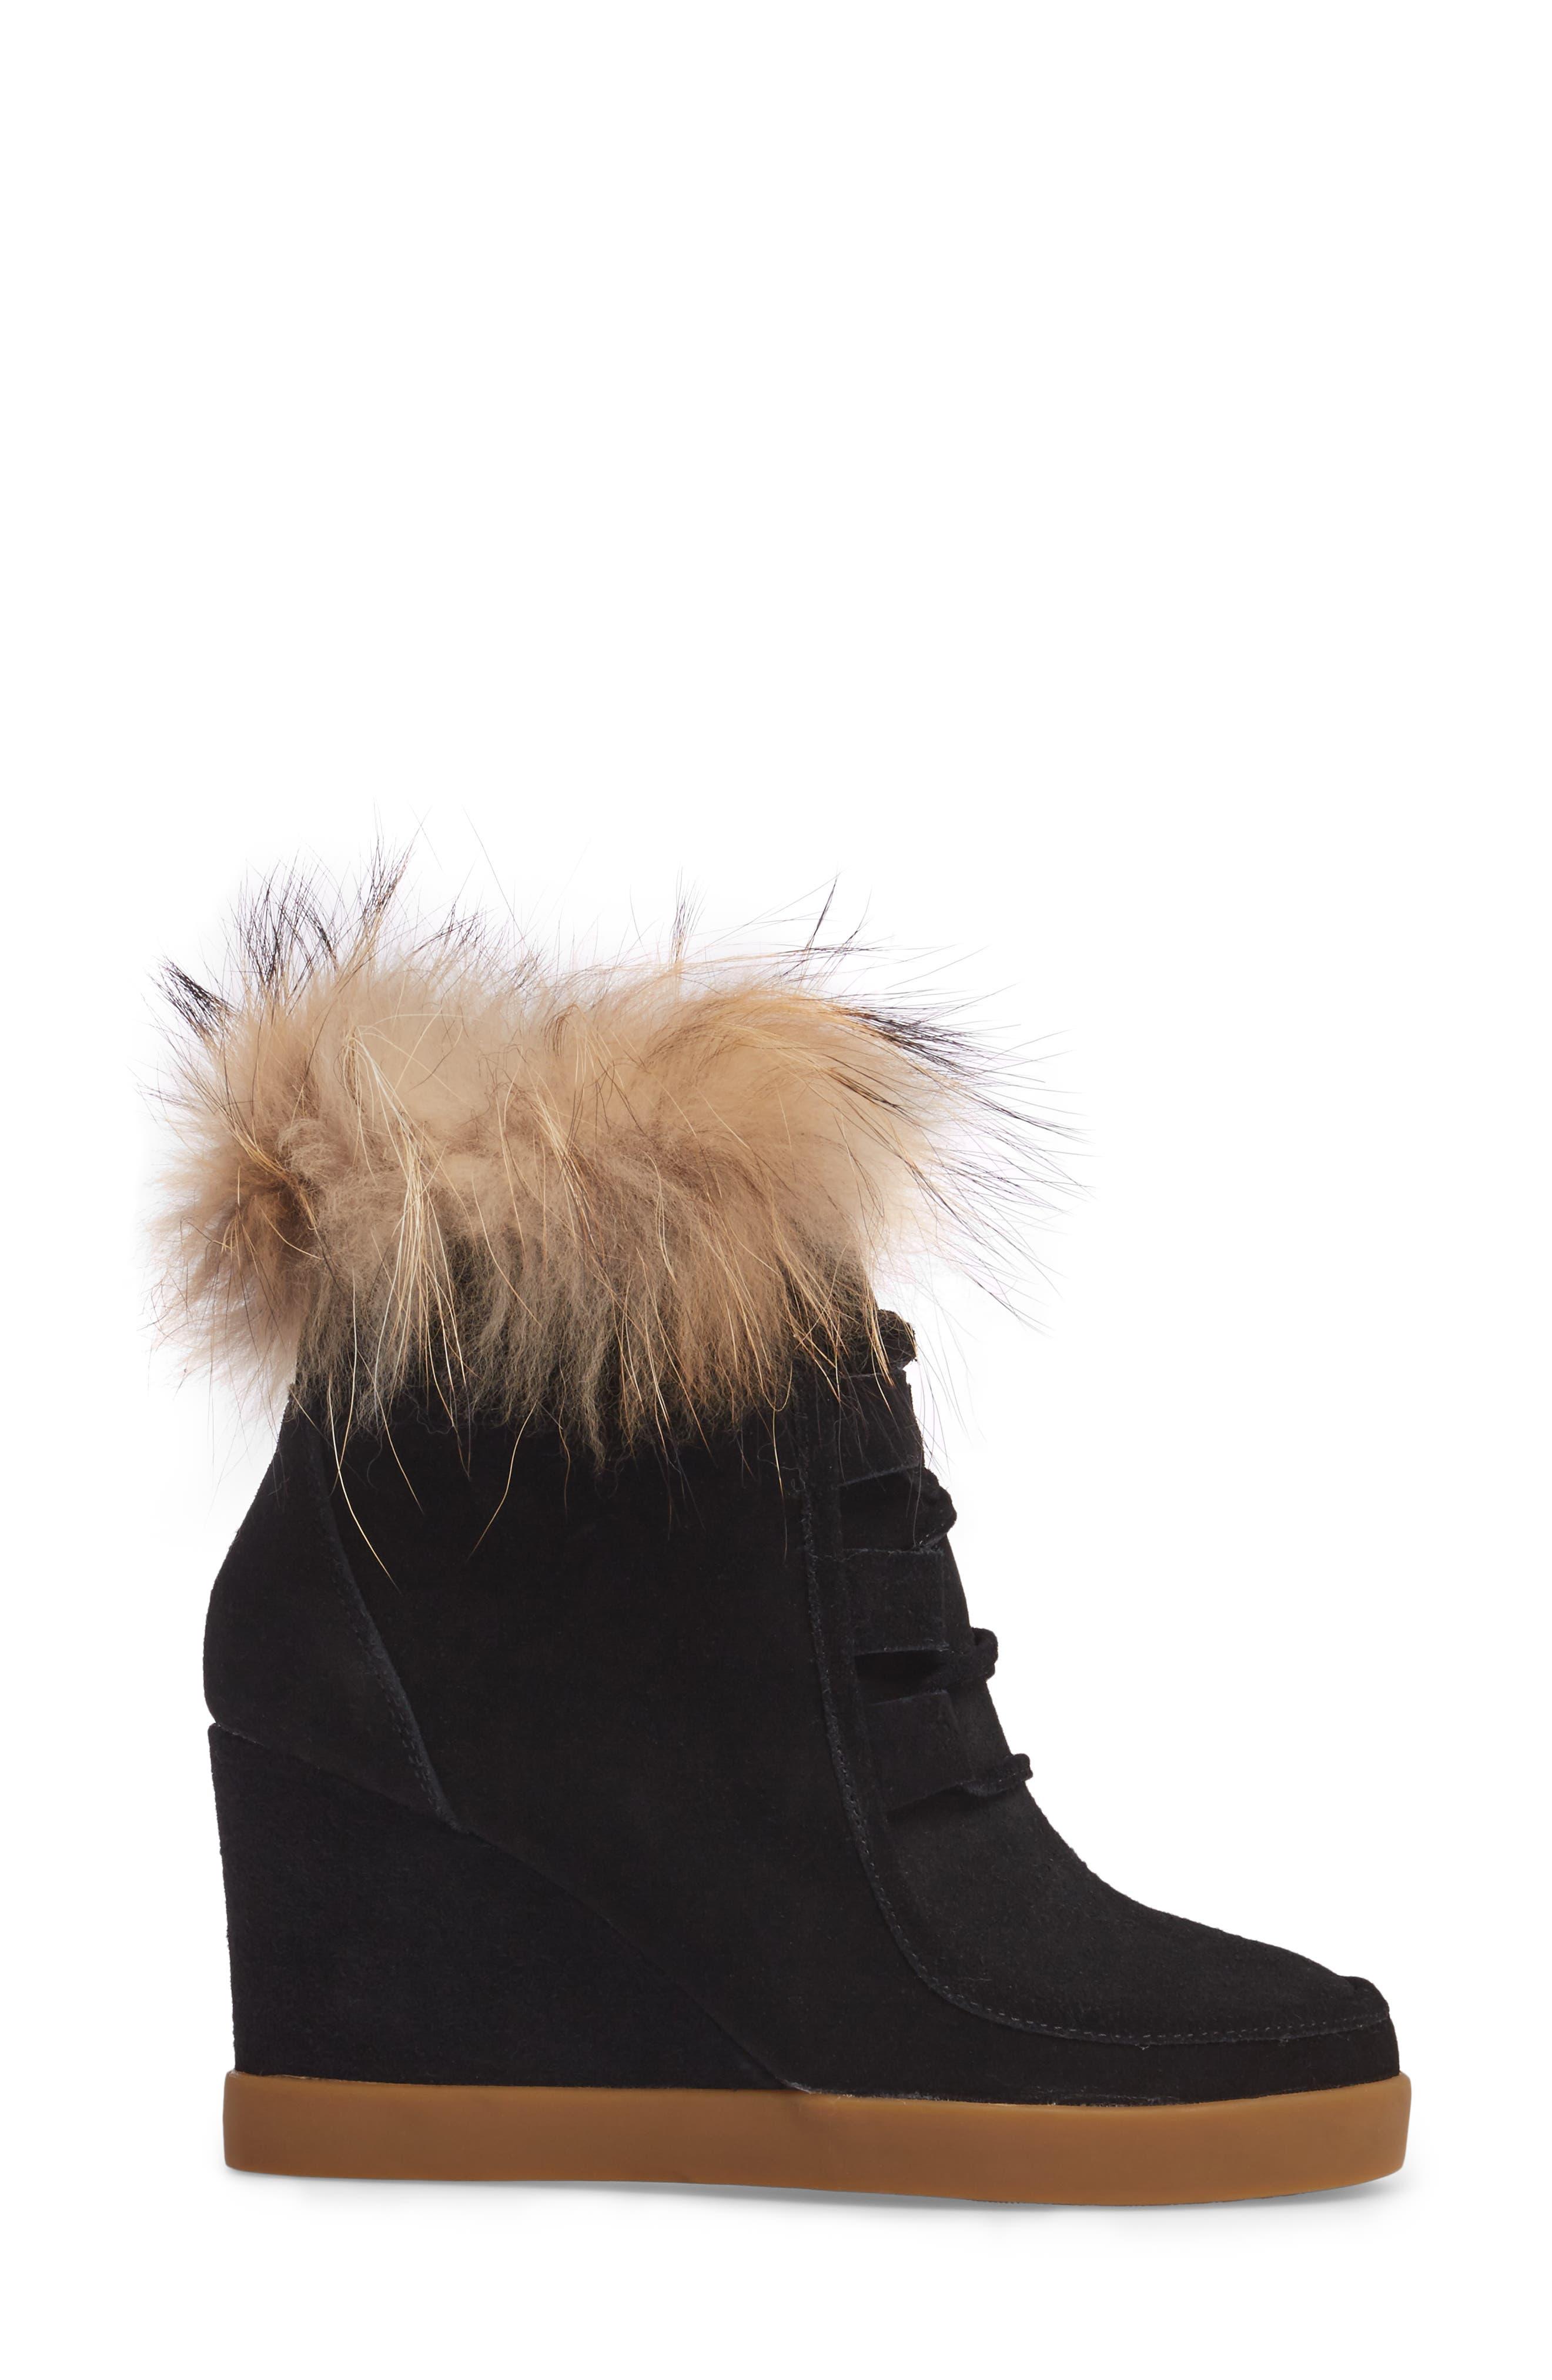 Alternate Image 3  - Cecelia New York Holly Wedge Bootie with Genuine Fox Fur Trim (Women)